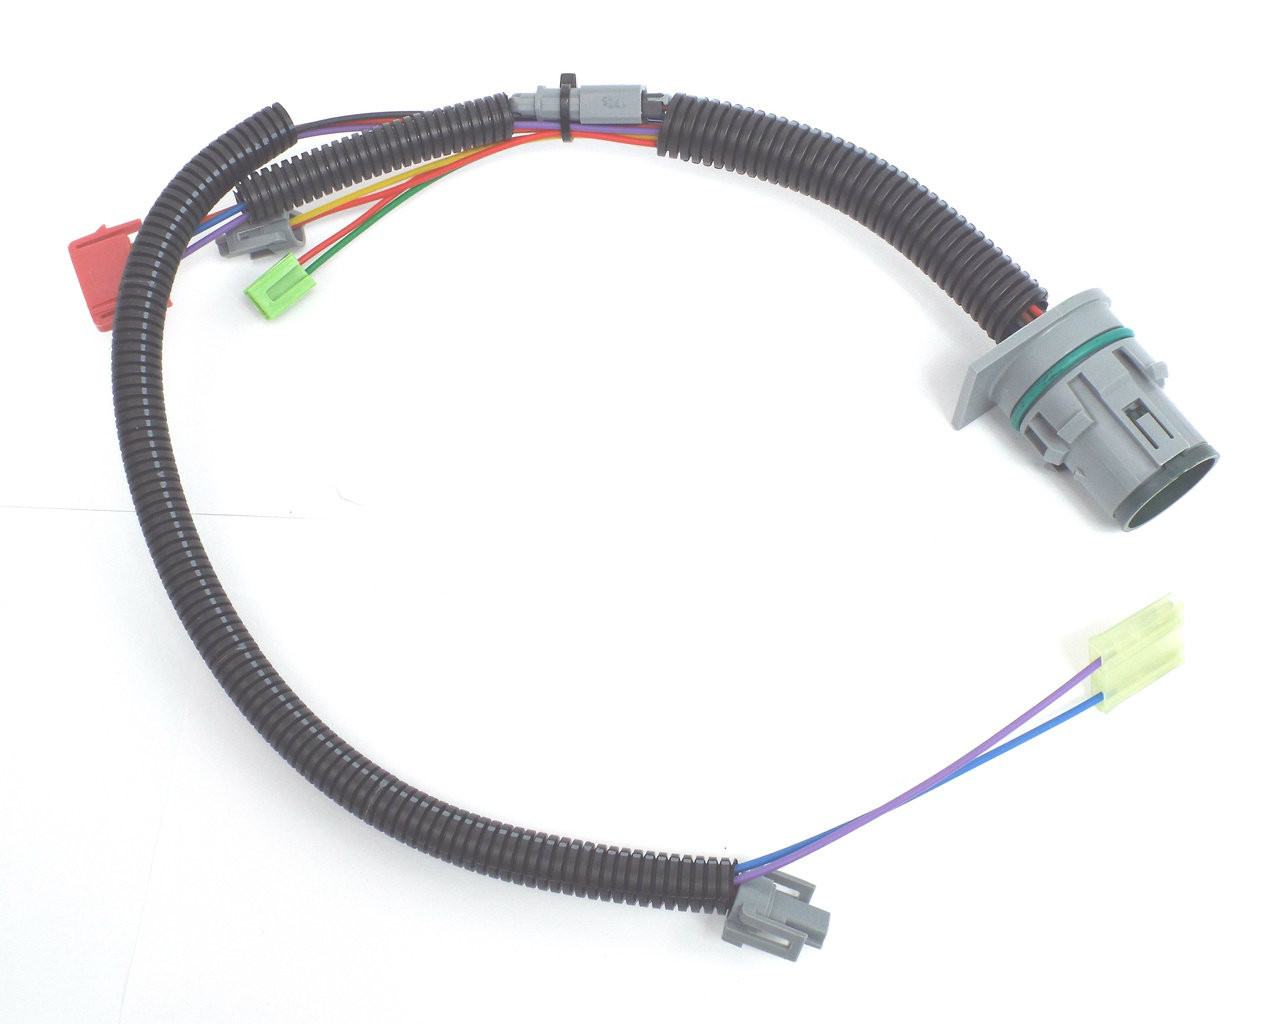 new 4l80e transmission hd internal valve body wiring harness 1991 2003 rh  globaltransmissionparts com 4L80E Transmission Electrical Diagrams 4L80E 12  Pin to ...